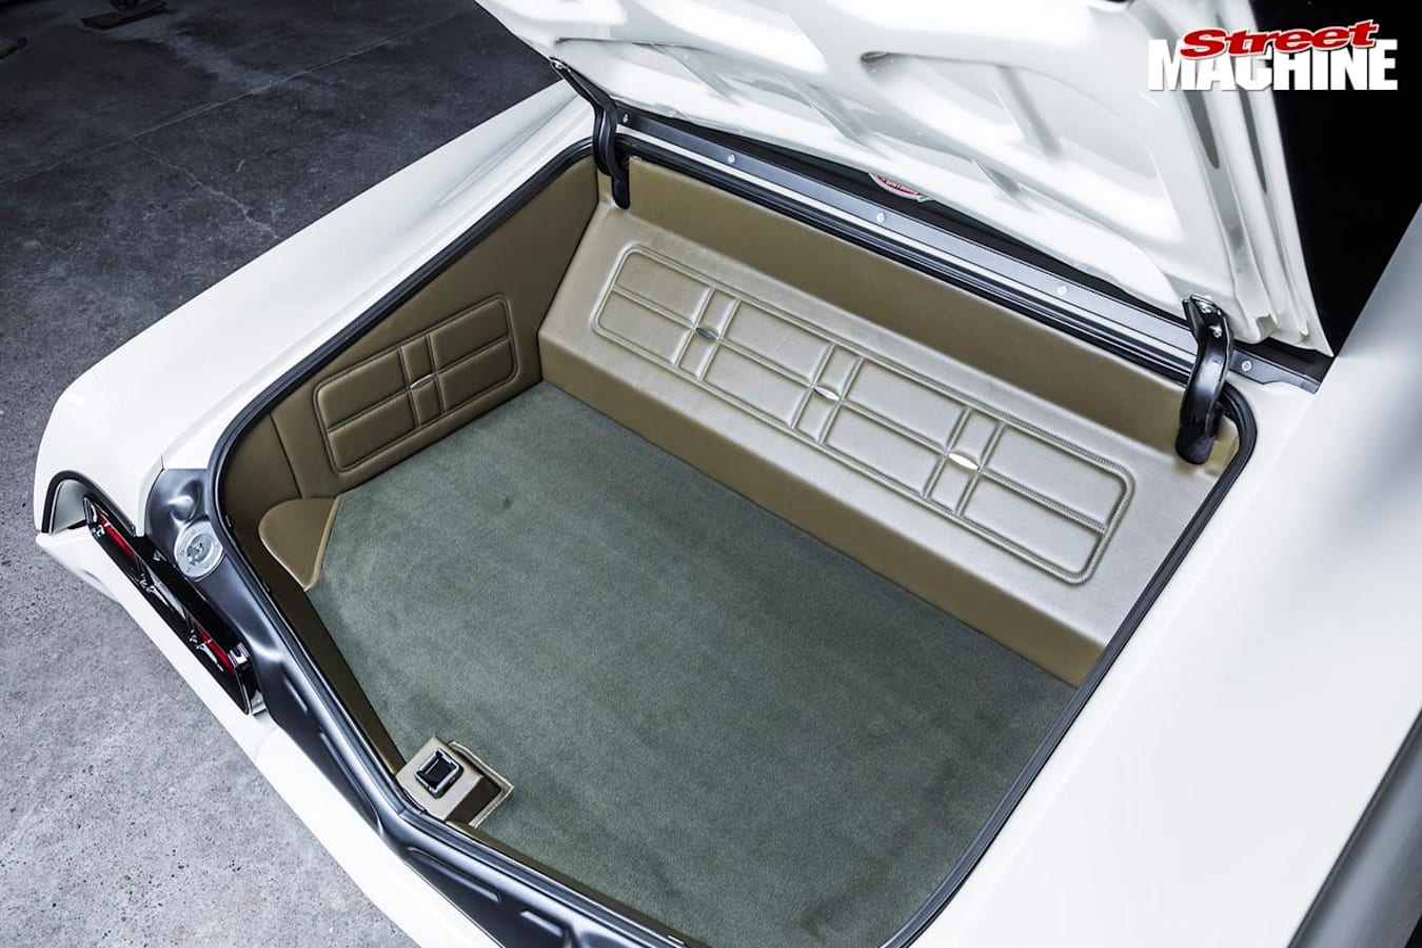 Chev Impala boot